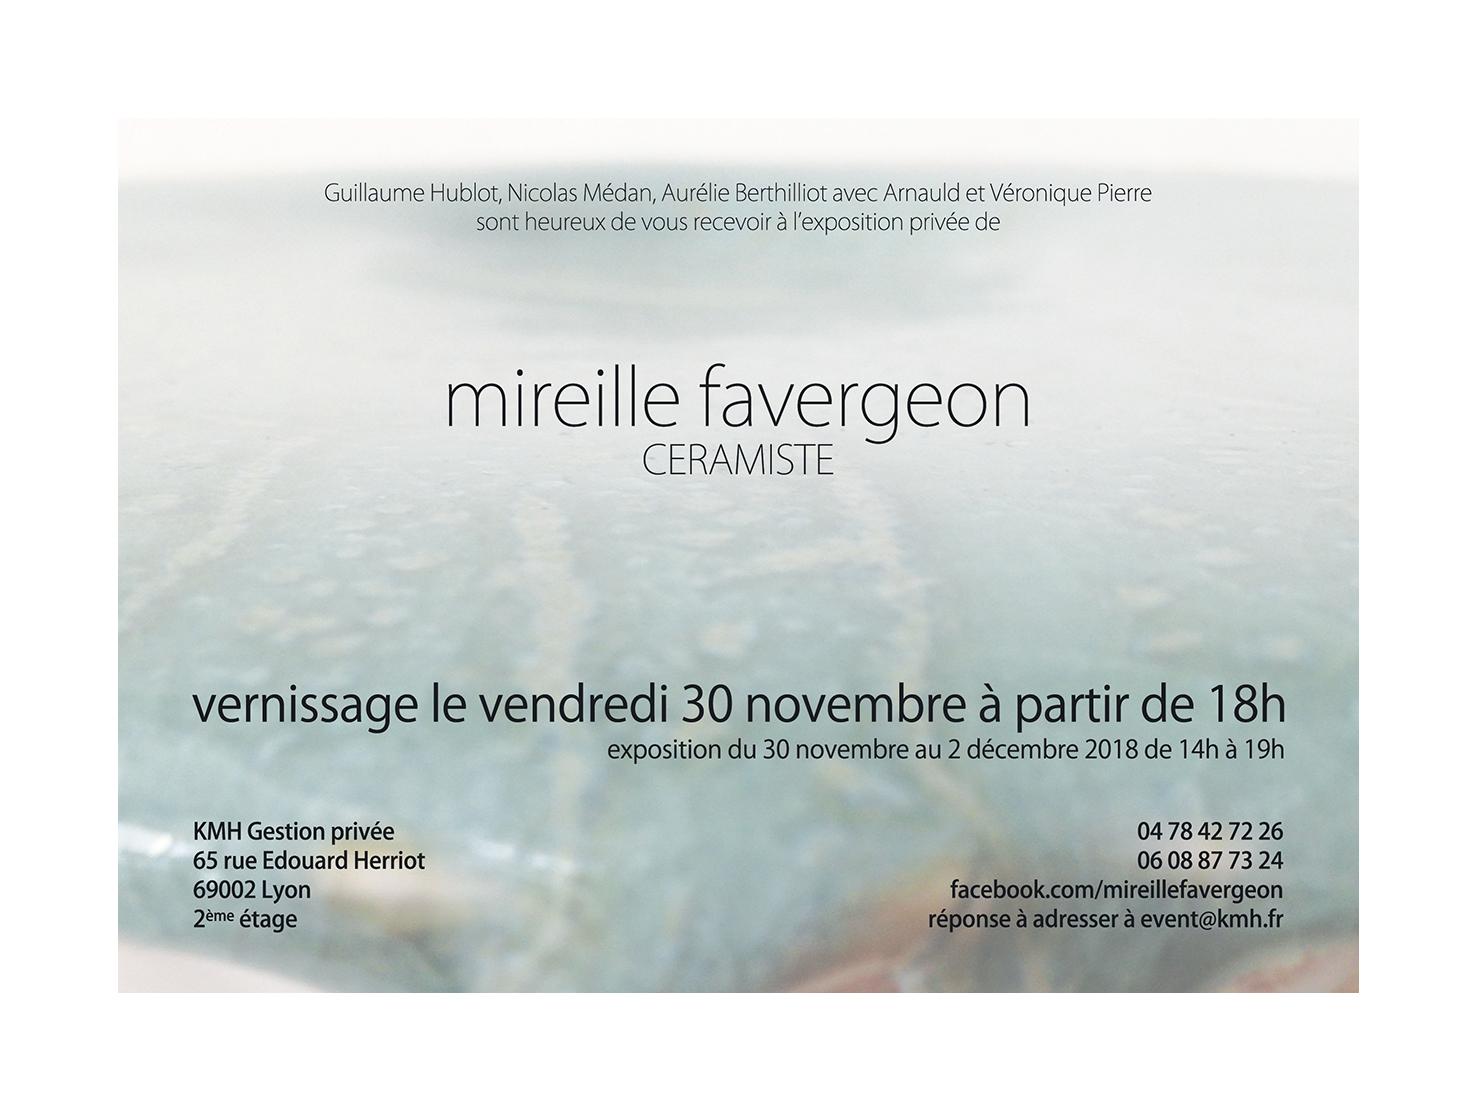 mireille-favergeon